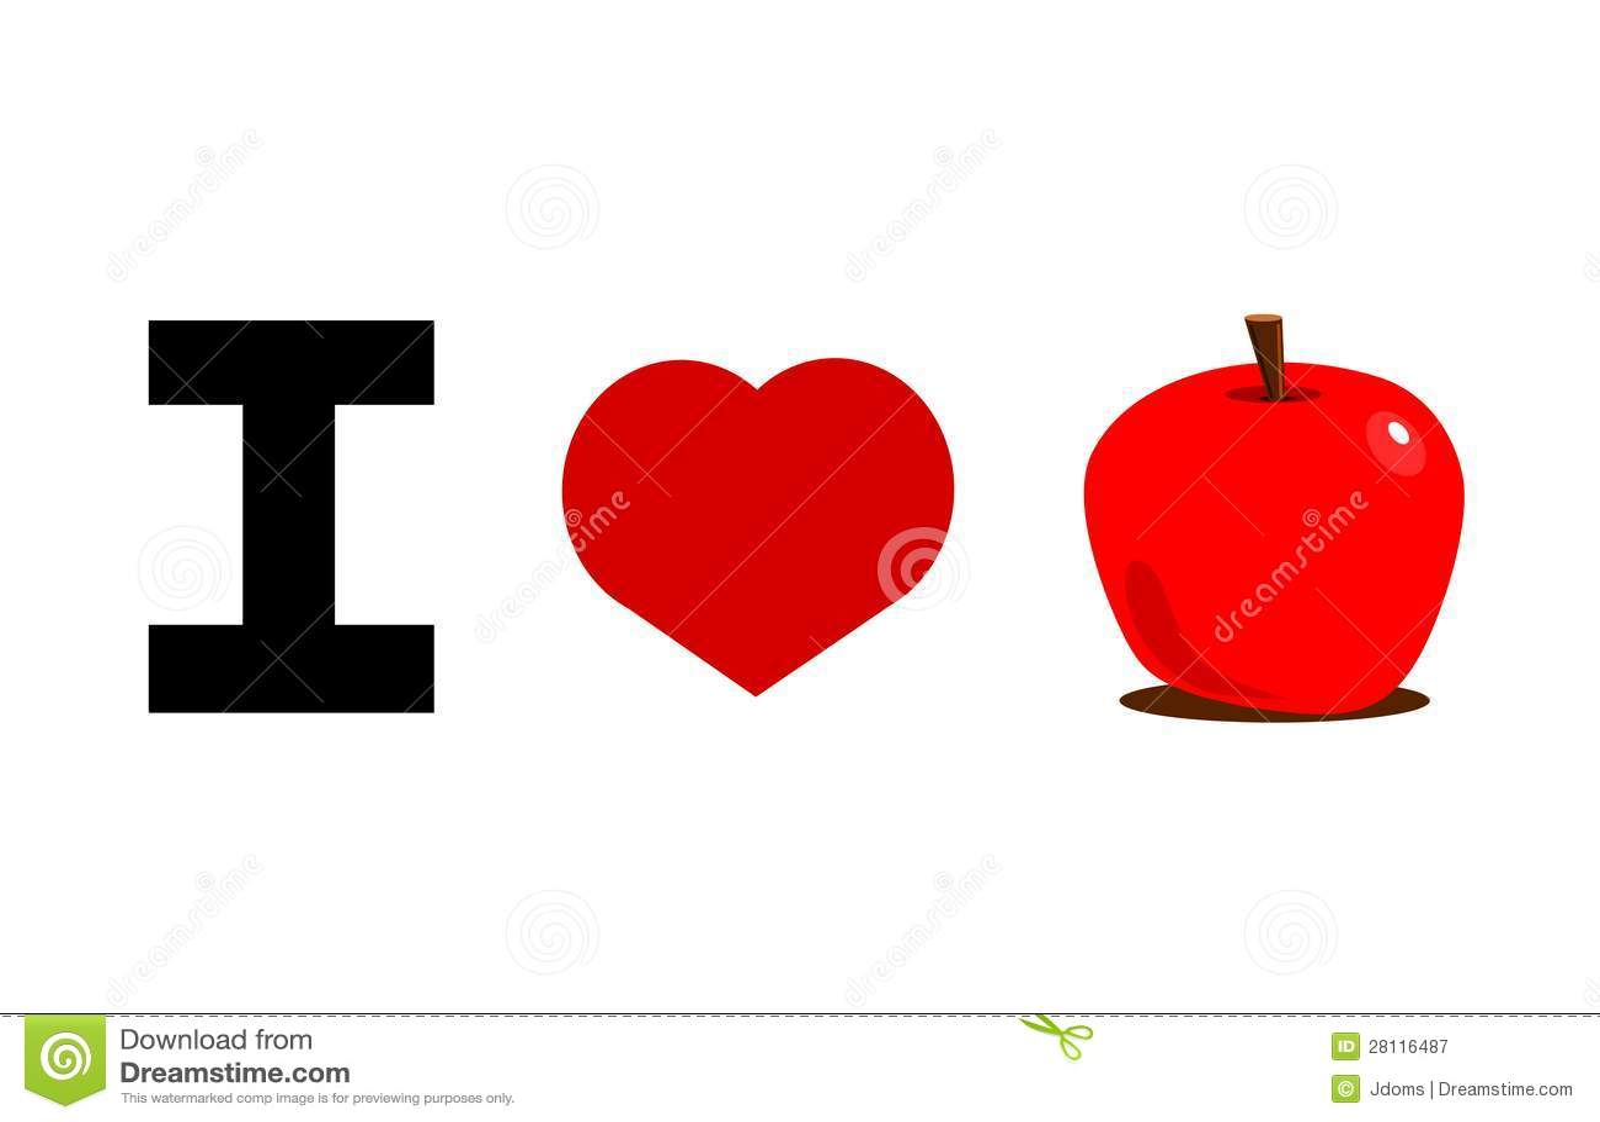 I love apples )